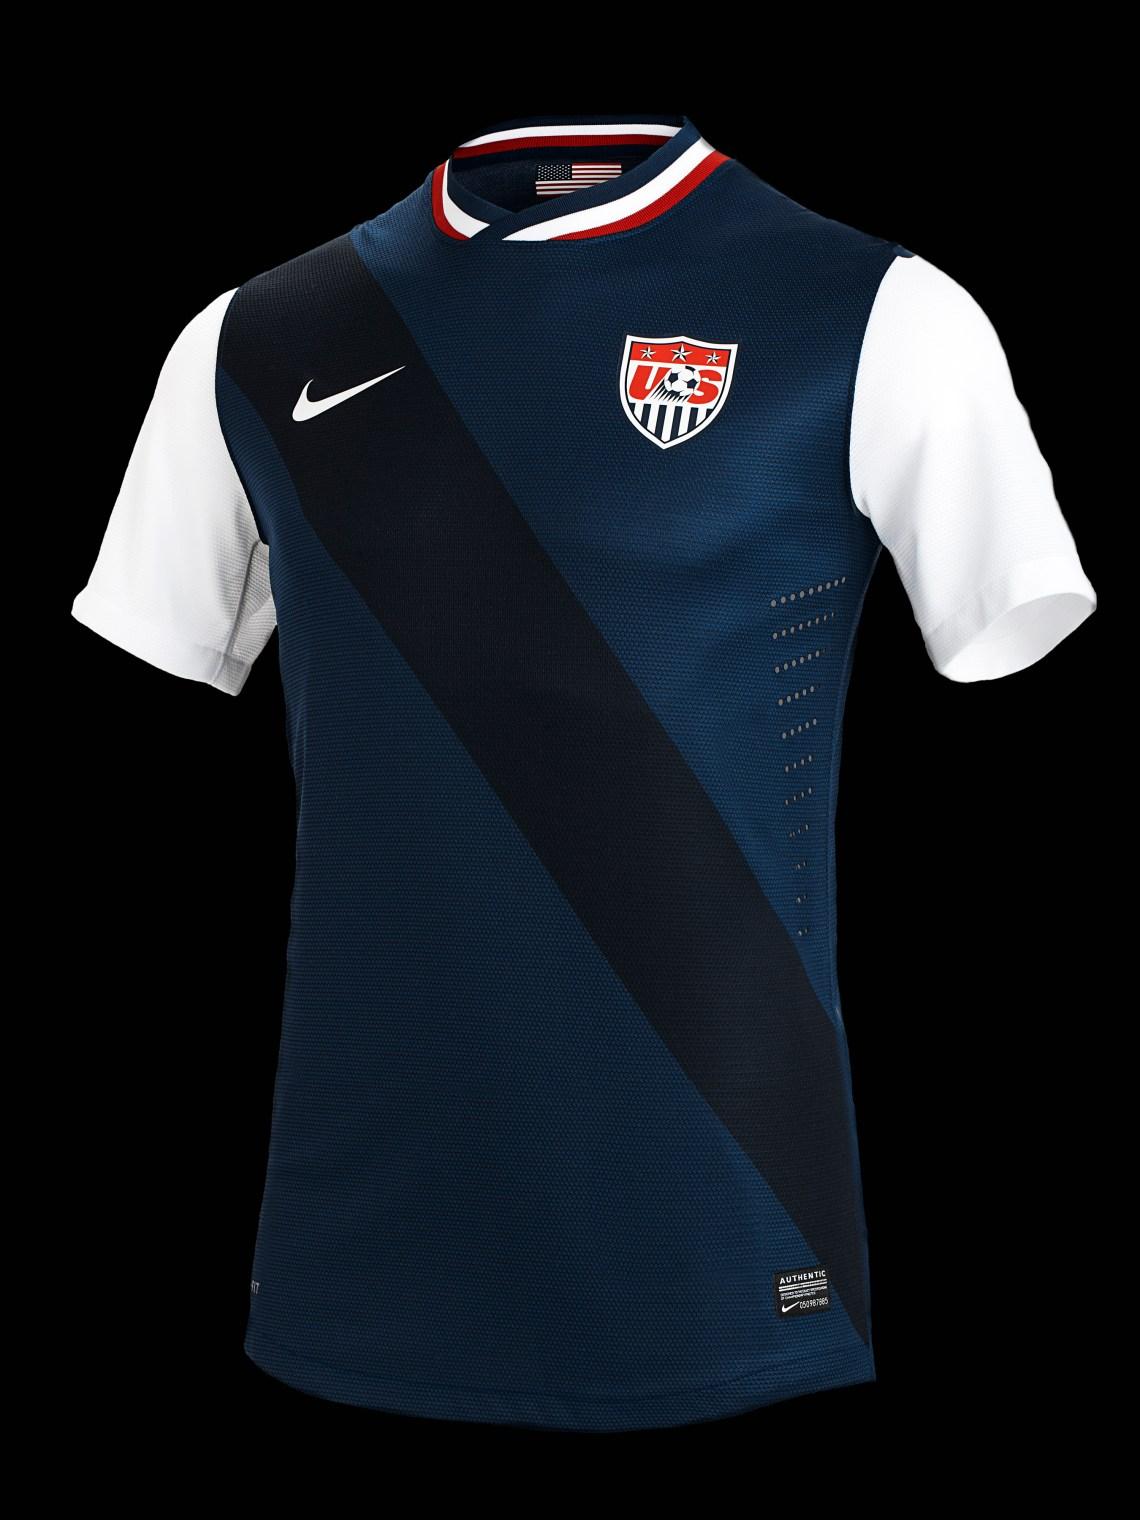 Download Nike Soccer unveils USA Away National Team Kit - Nike News